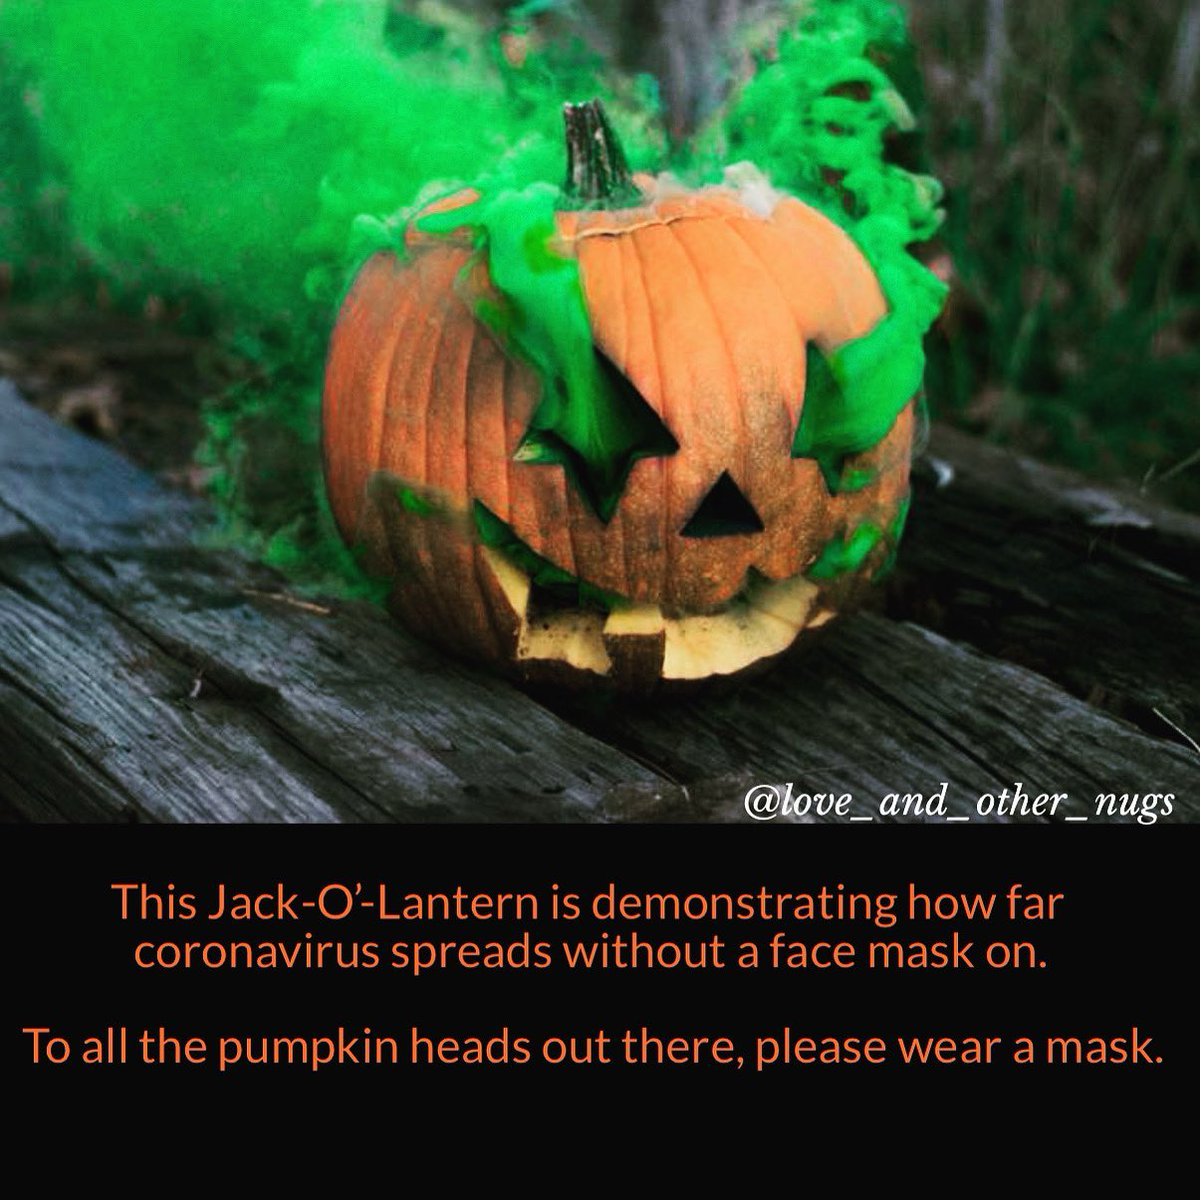 Don't be like this pumpkin head, wear a #facemask.  #October1st #Halloween2020 #coronavirus #COVID19 #Memes #writersofinstagram #WritingCommunity https://t.co/zgJFrfAiUs